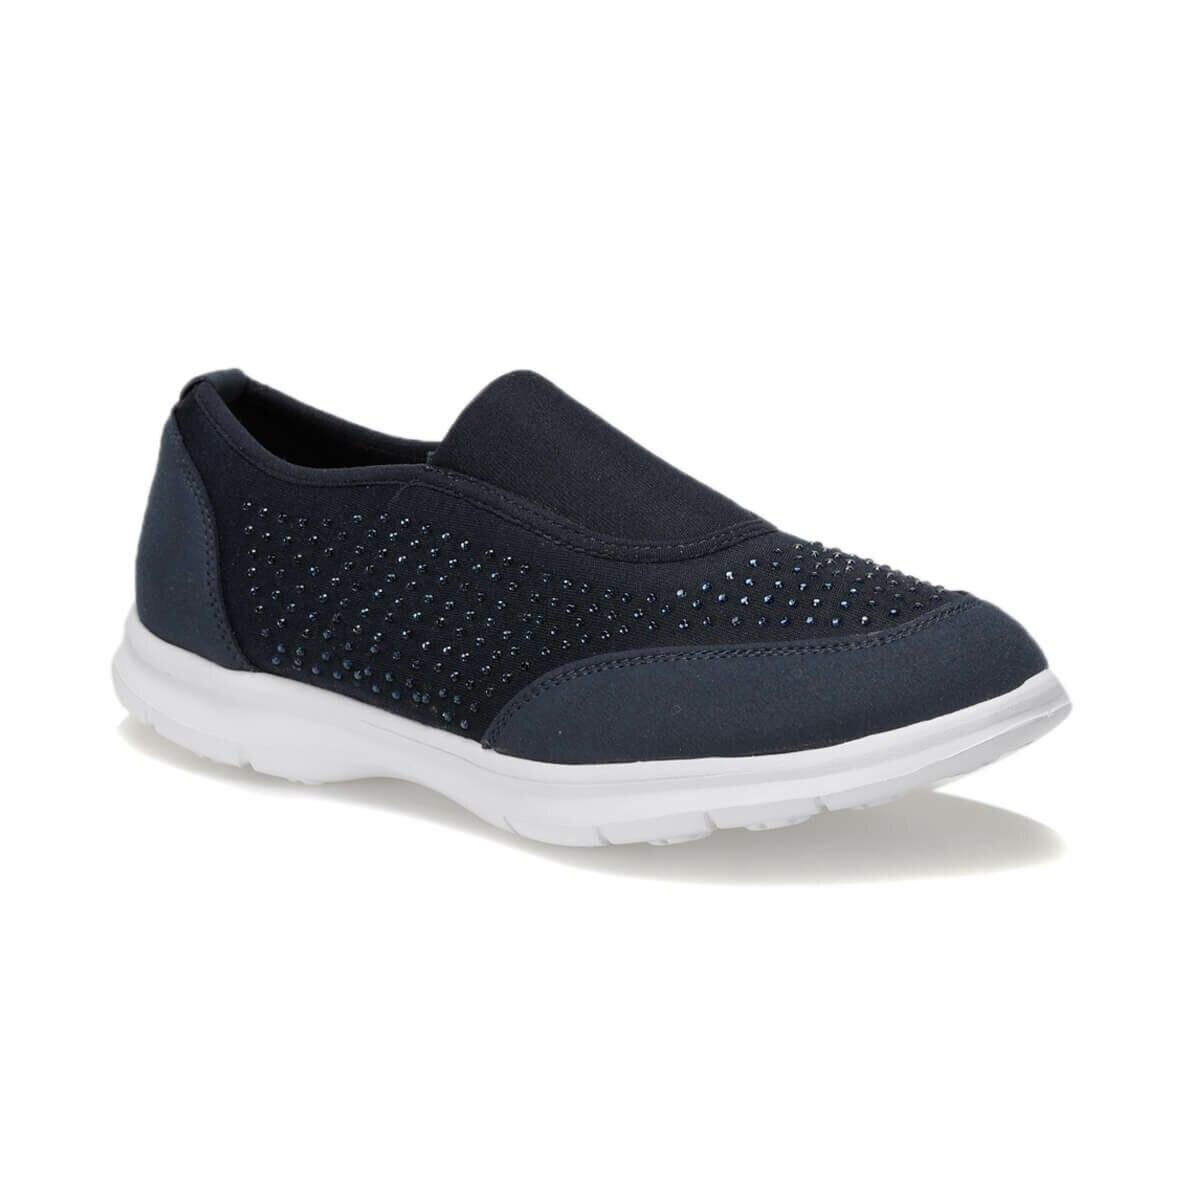 FLO CS18116-19IY Navy Blue Women 'S Slip On Shoes BUTIGO